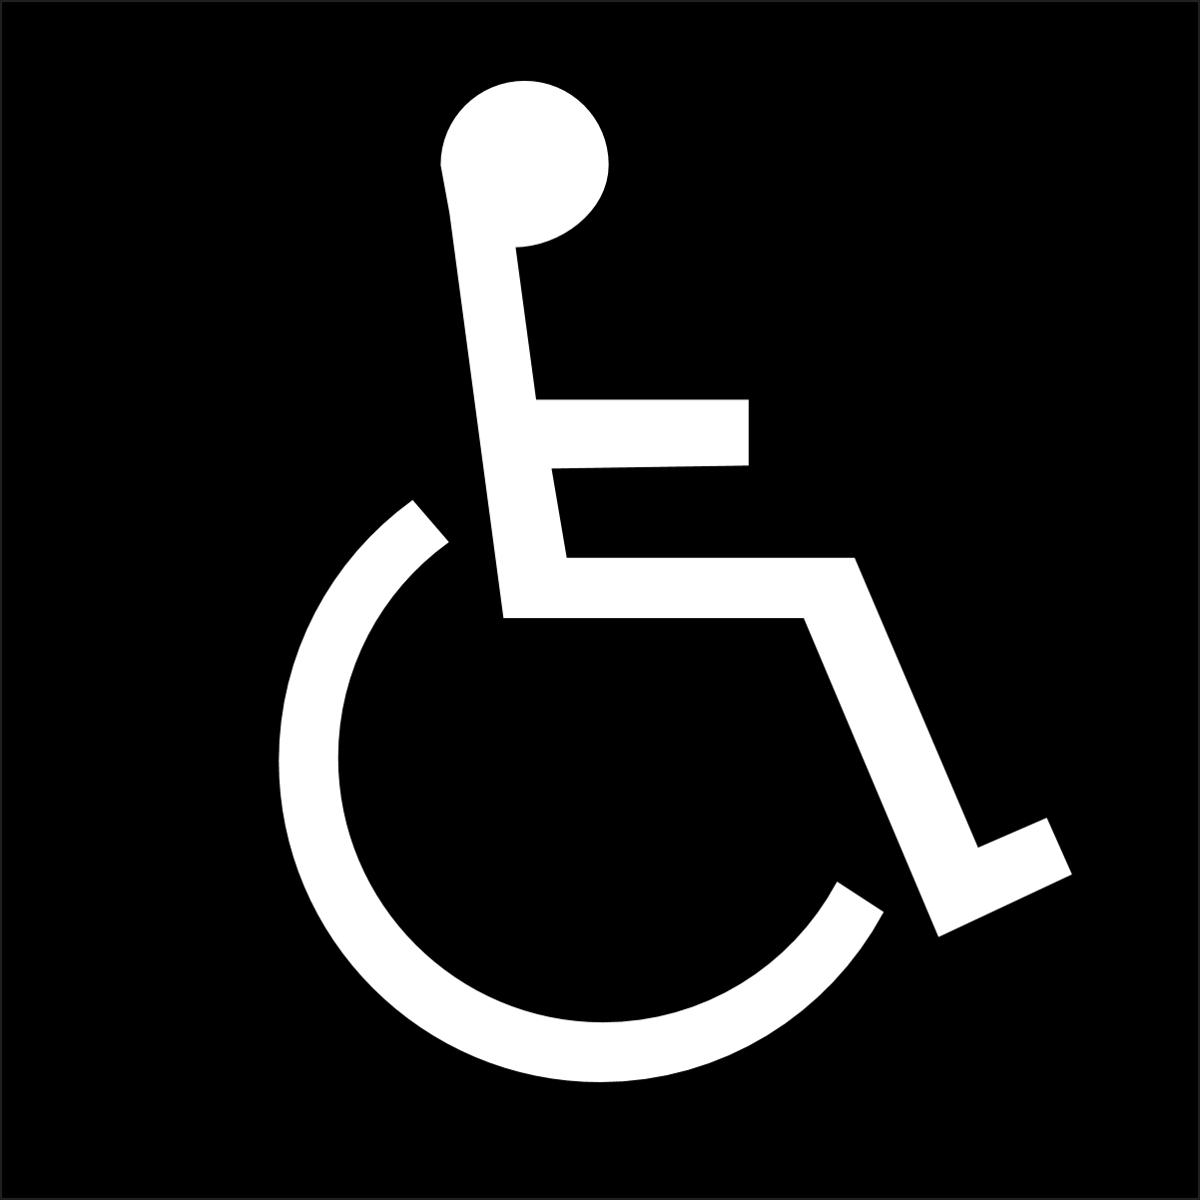 brady part 70123 braille ada handicap sign bradyid com rh bradyid com Wheelchair Logo Design Handicap Logo Vector